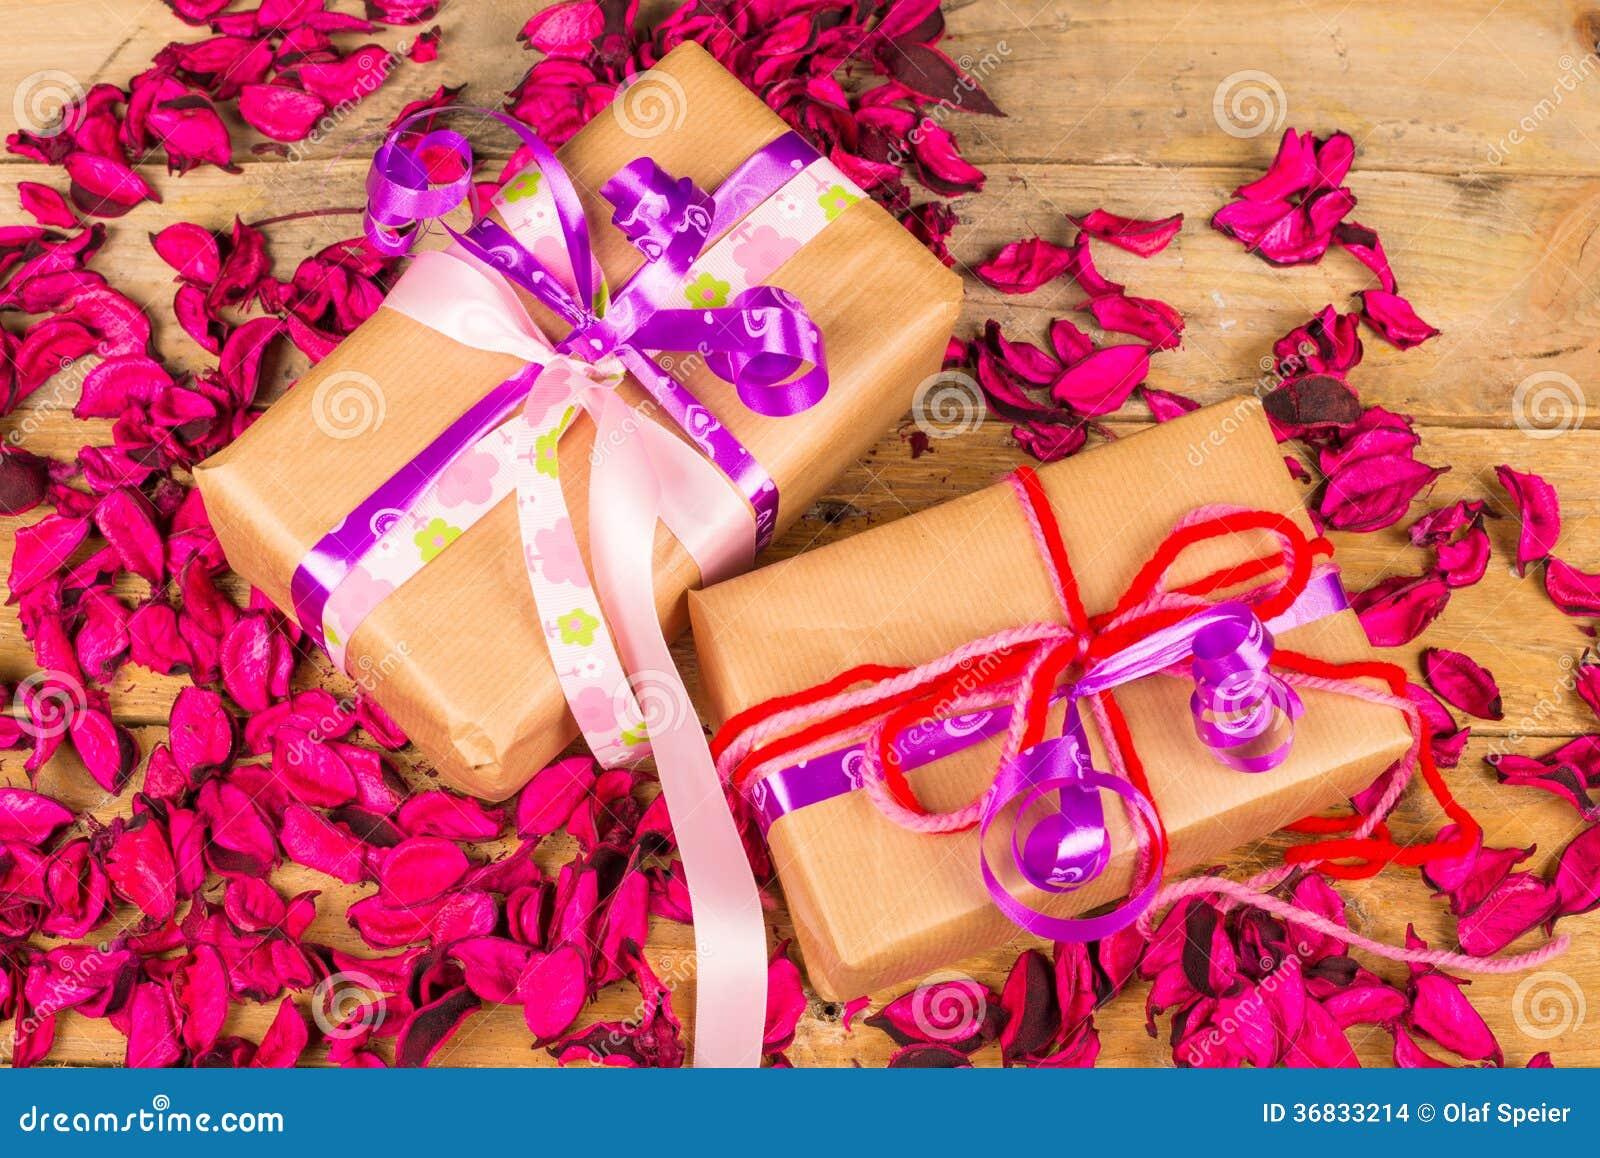 Romantic Presents Stock Photo Image Of Holiday Romantic 36833214